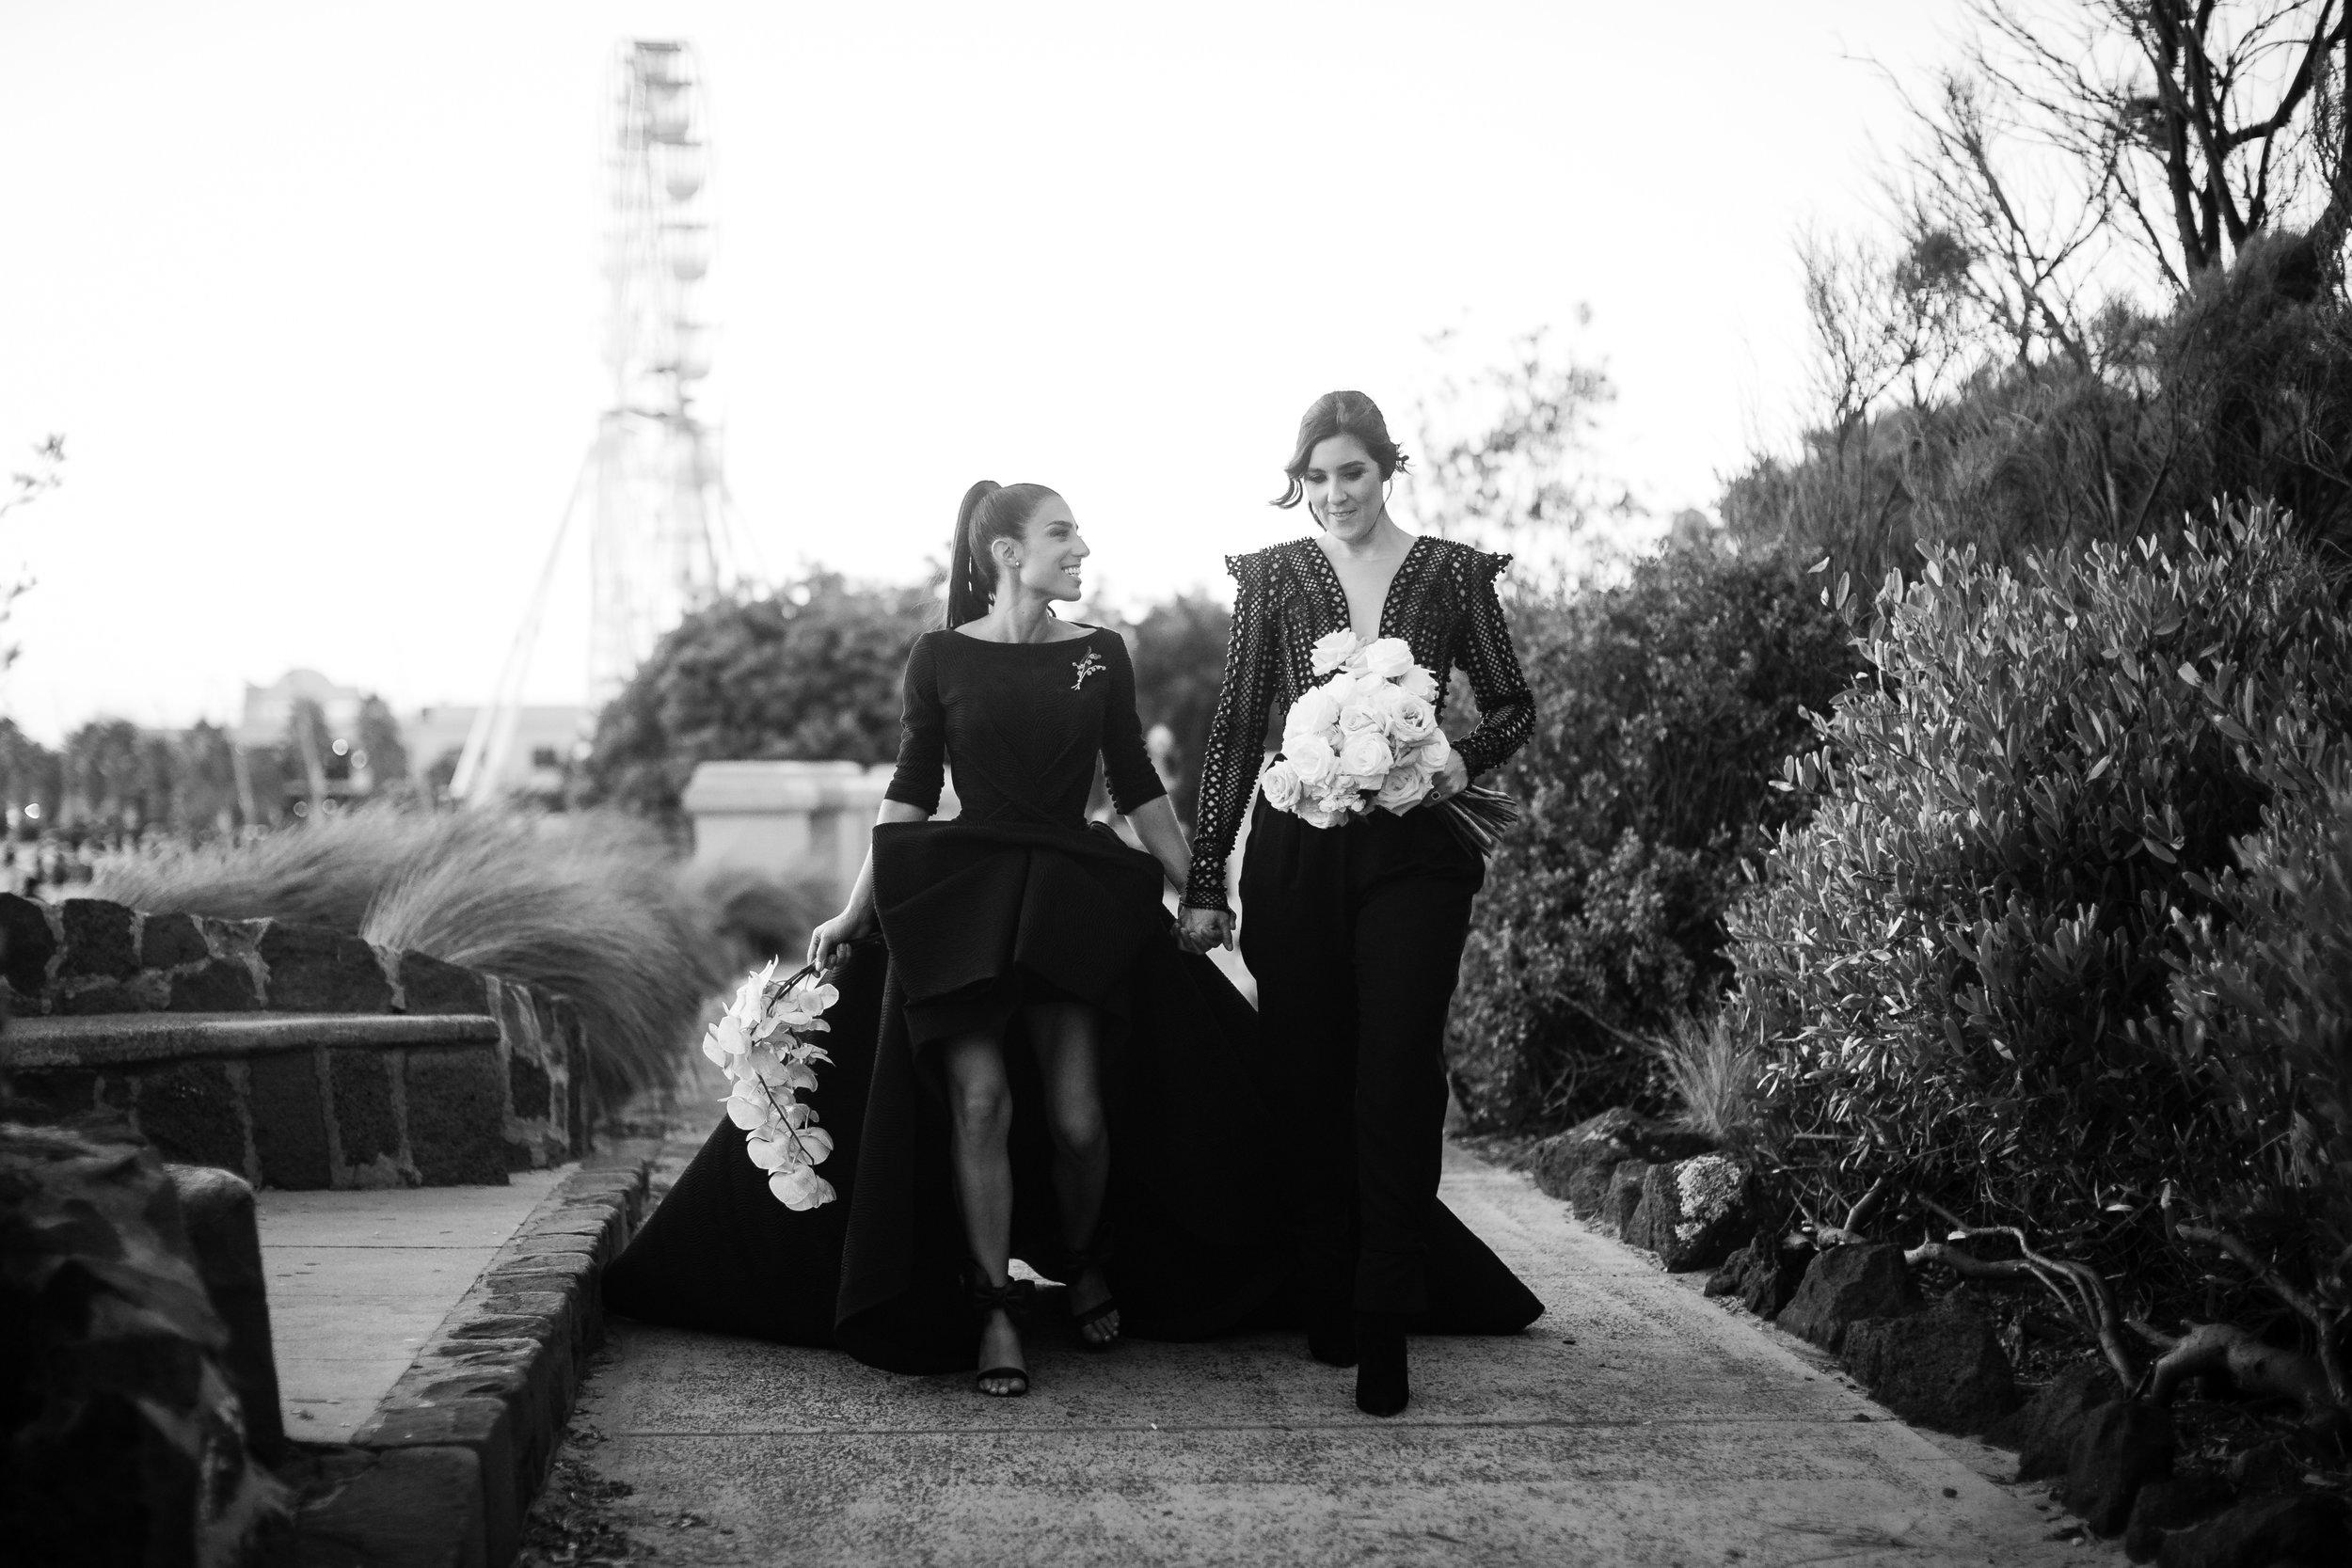 Antoinette&ChloeWedding_Highlights-23.jpg